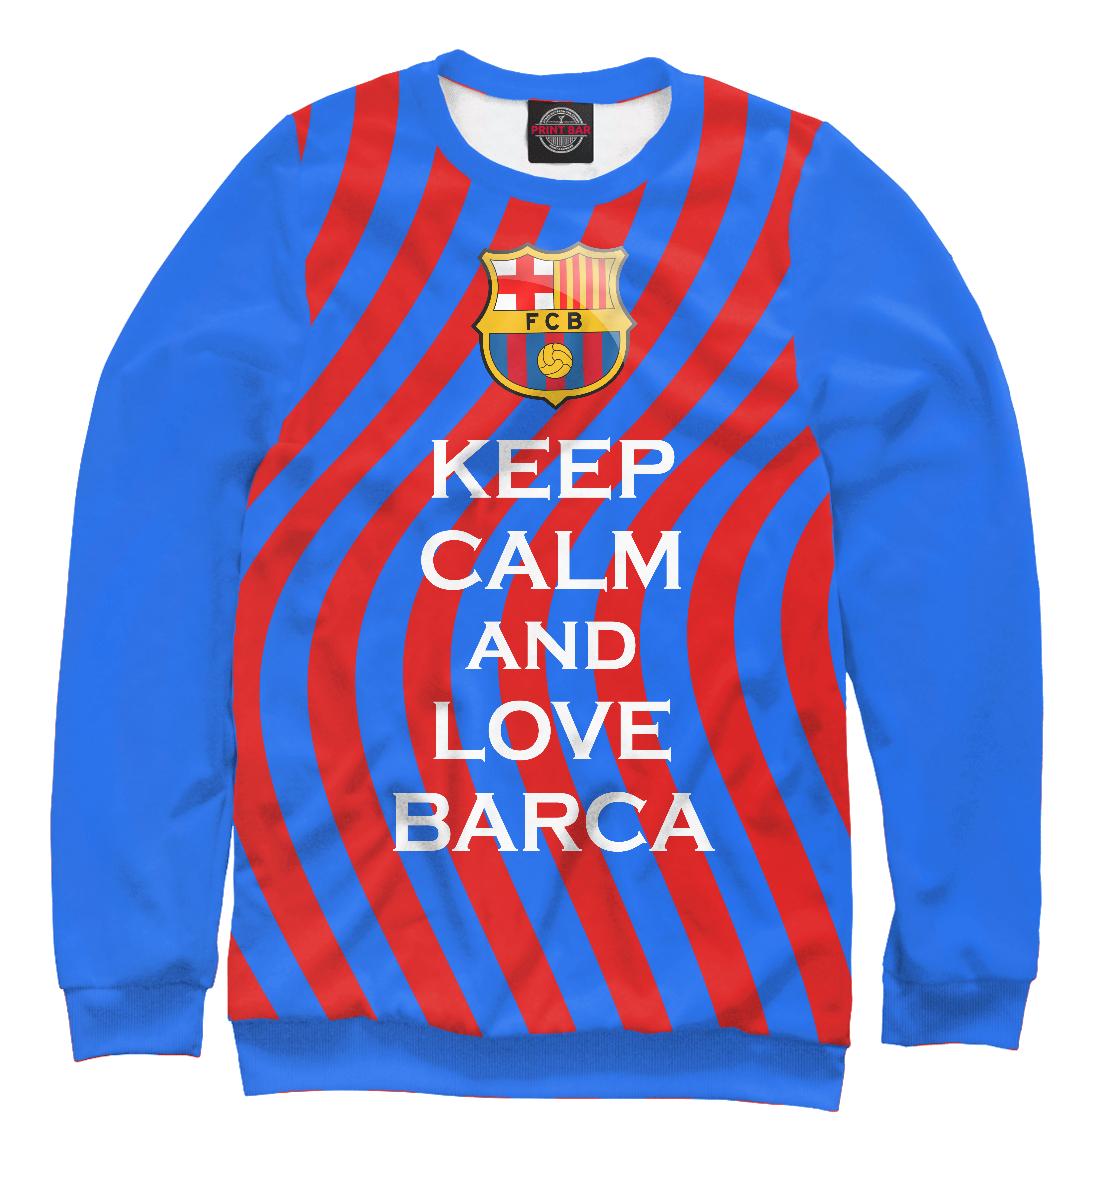 Купить Keep Calm and Love Barca, Printbar, Свитшоты, BAR-623531-swi-2